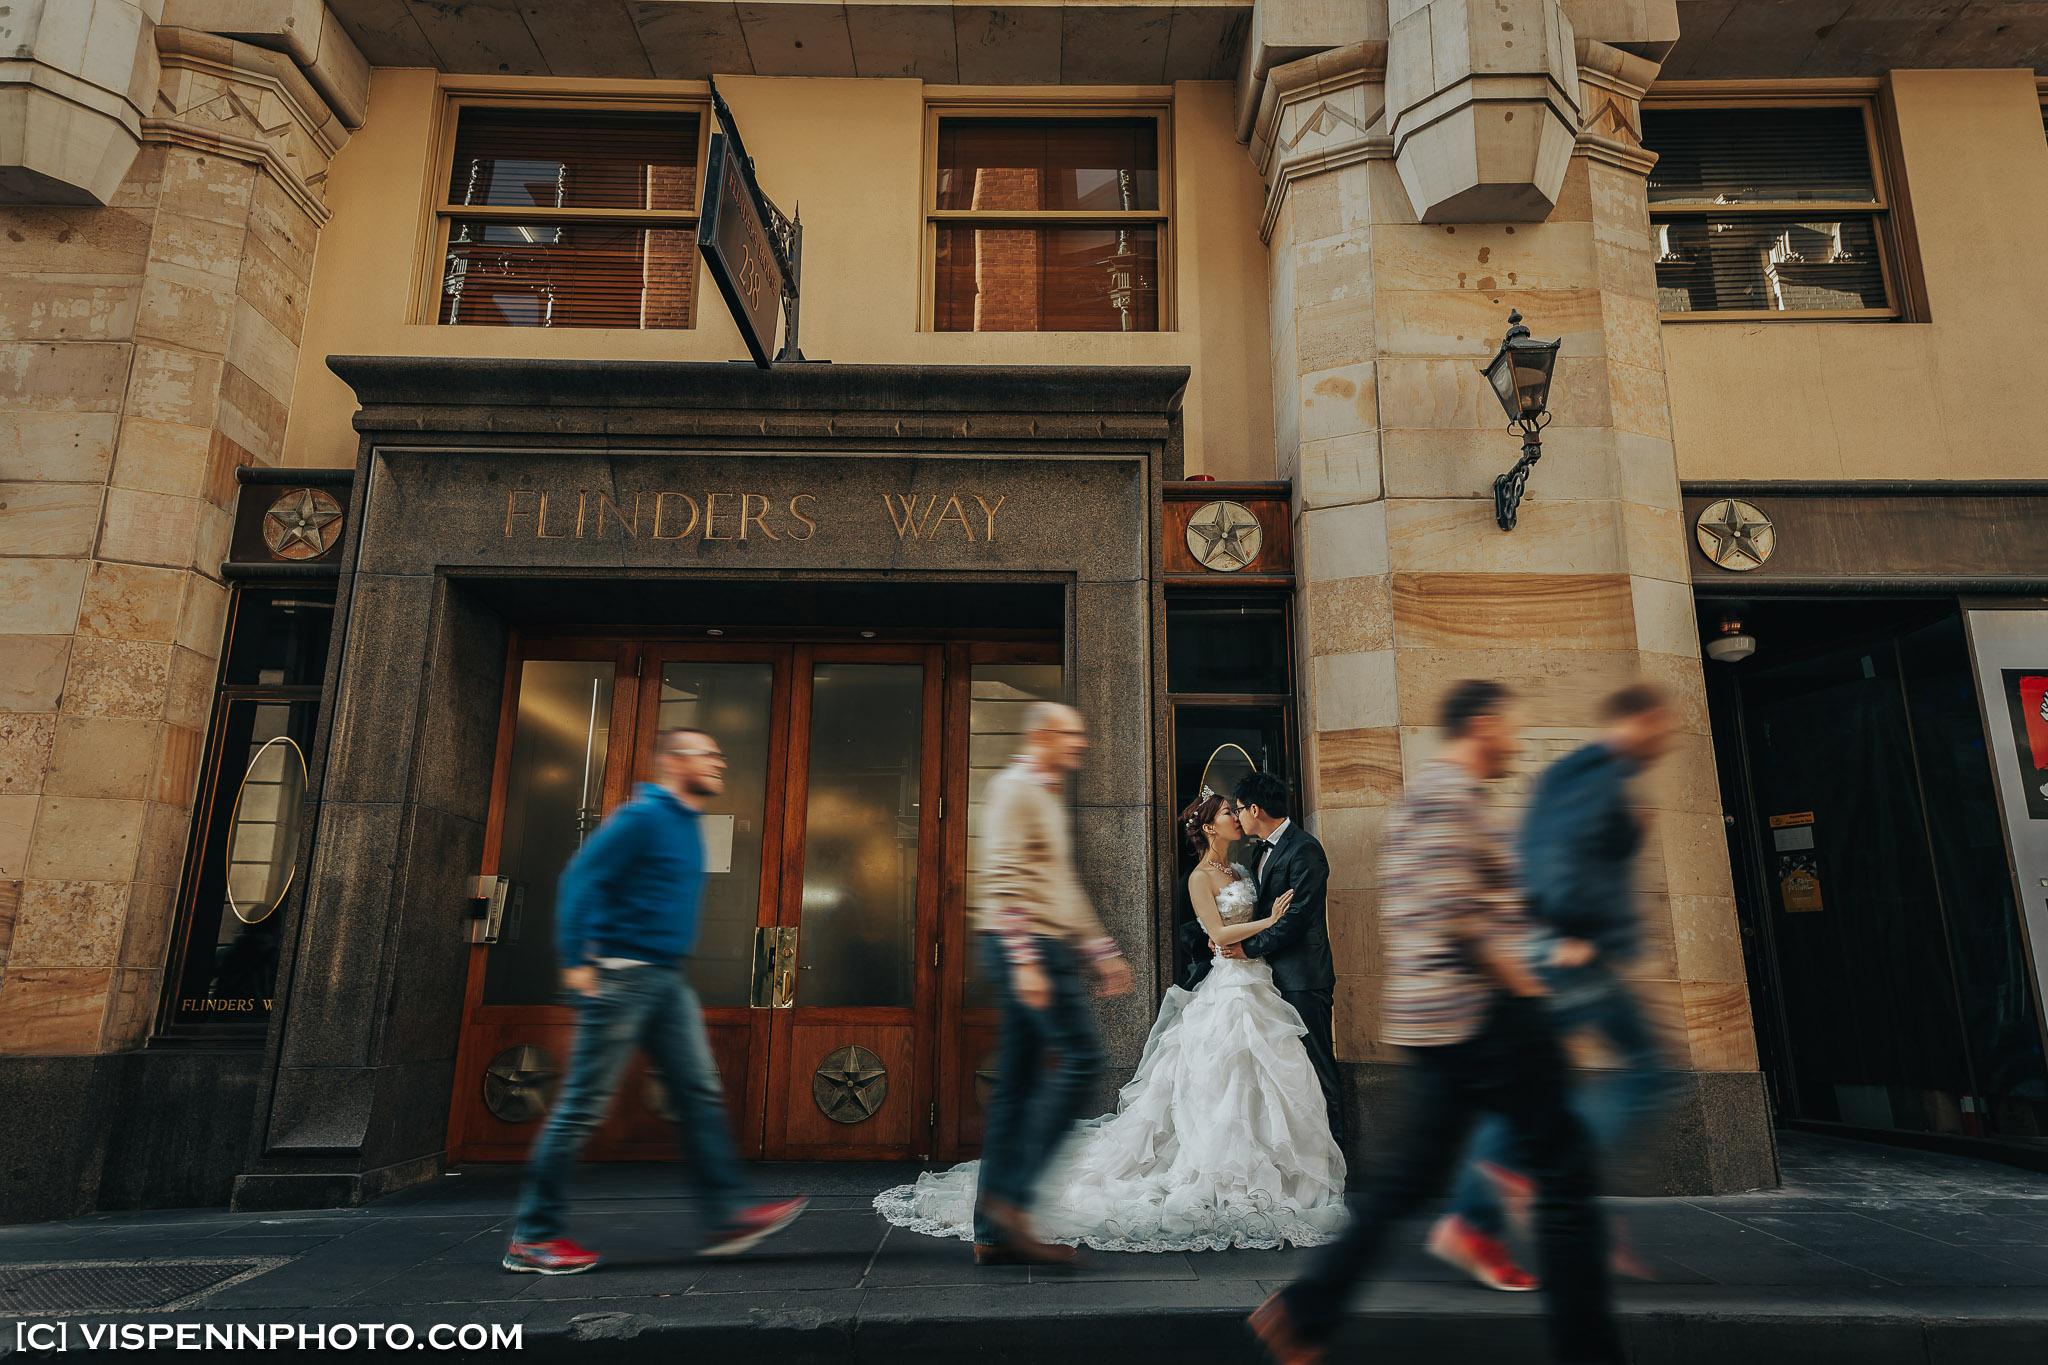 PRE WEDDING Photography Melbourne VISPENN 墨尔本 婚纱照 结婚照 婚纱摄影 VISPENN AllenWang 1977